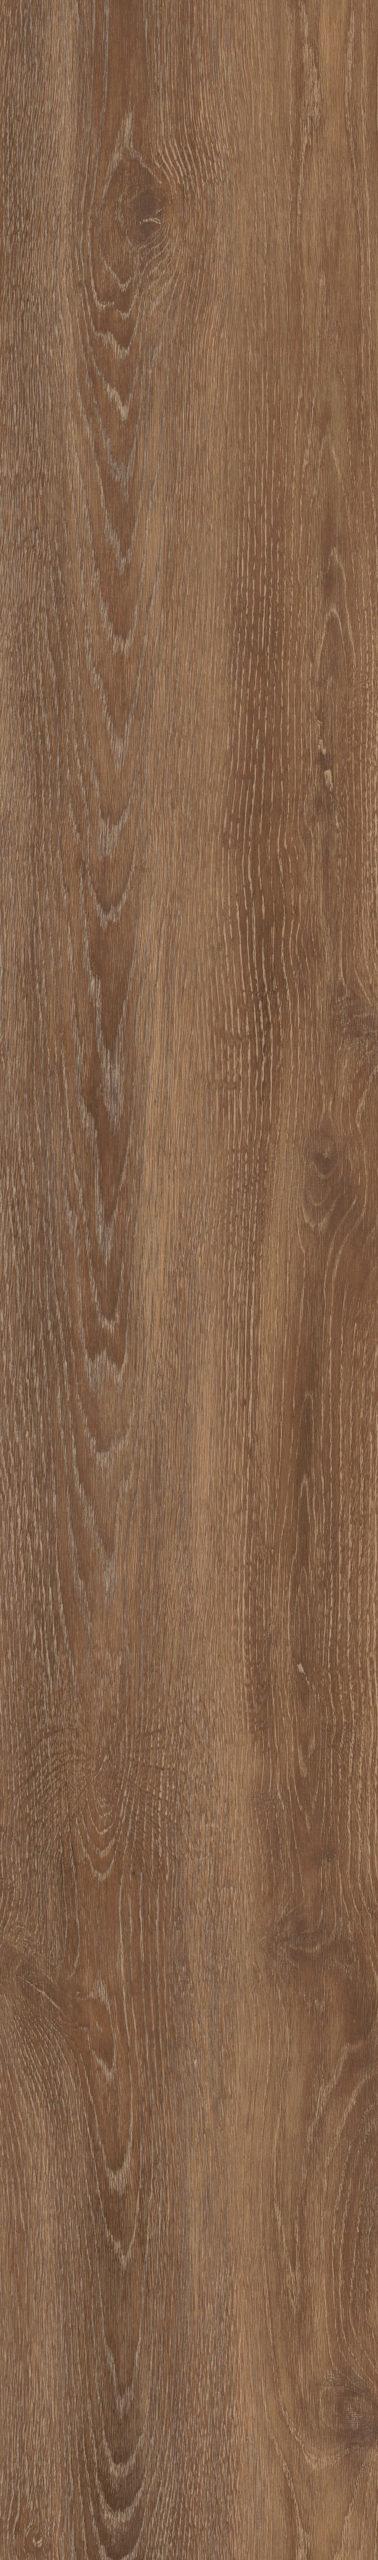 Authentic Oak XL Liguria